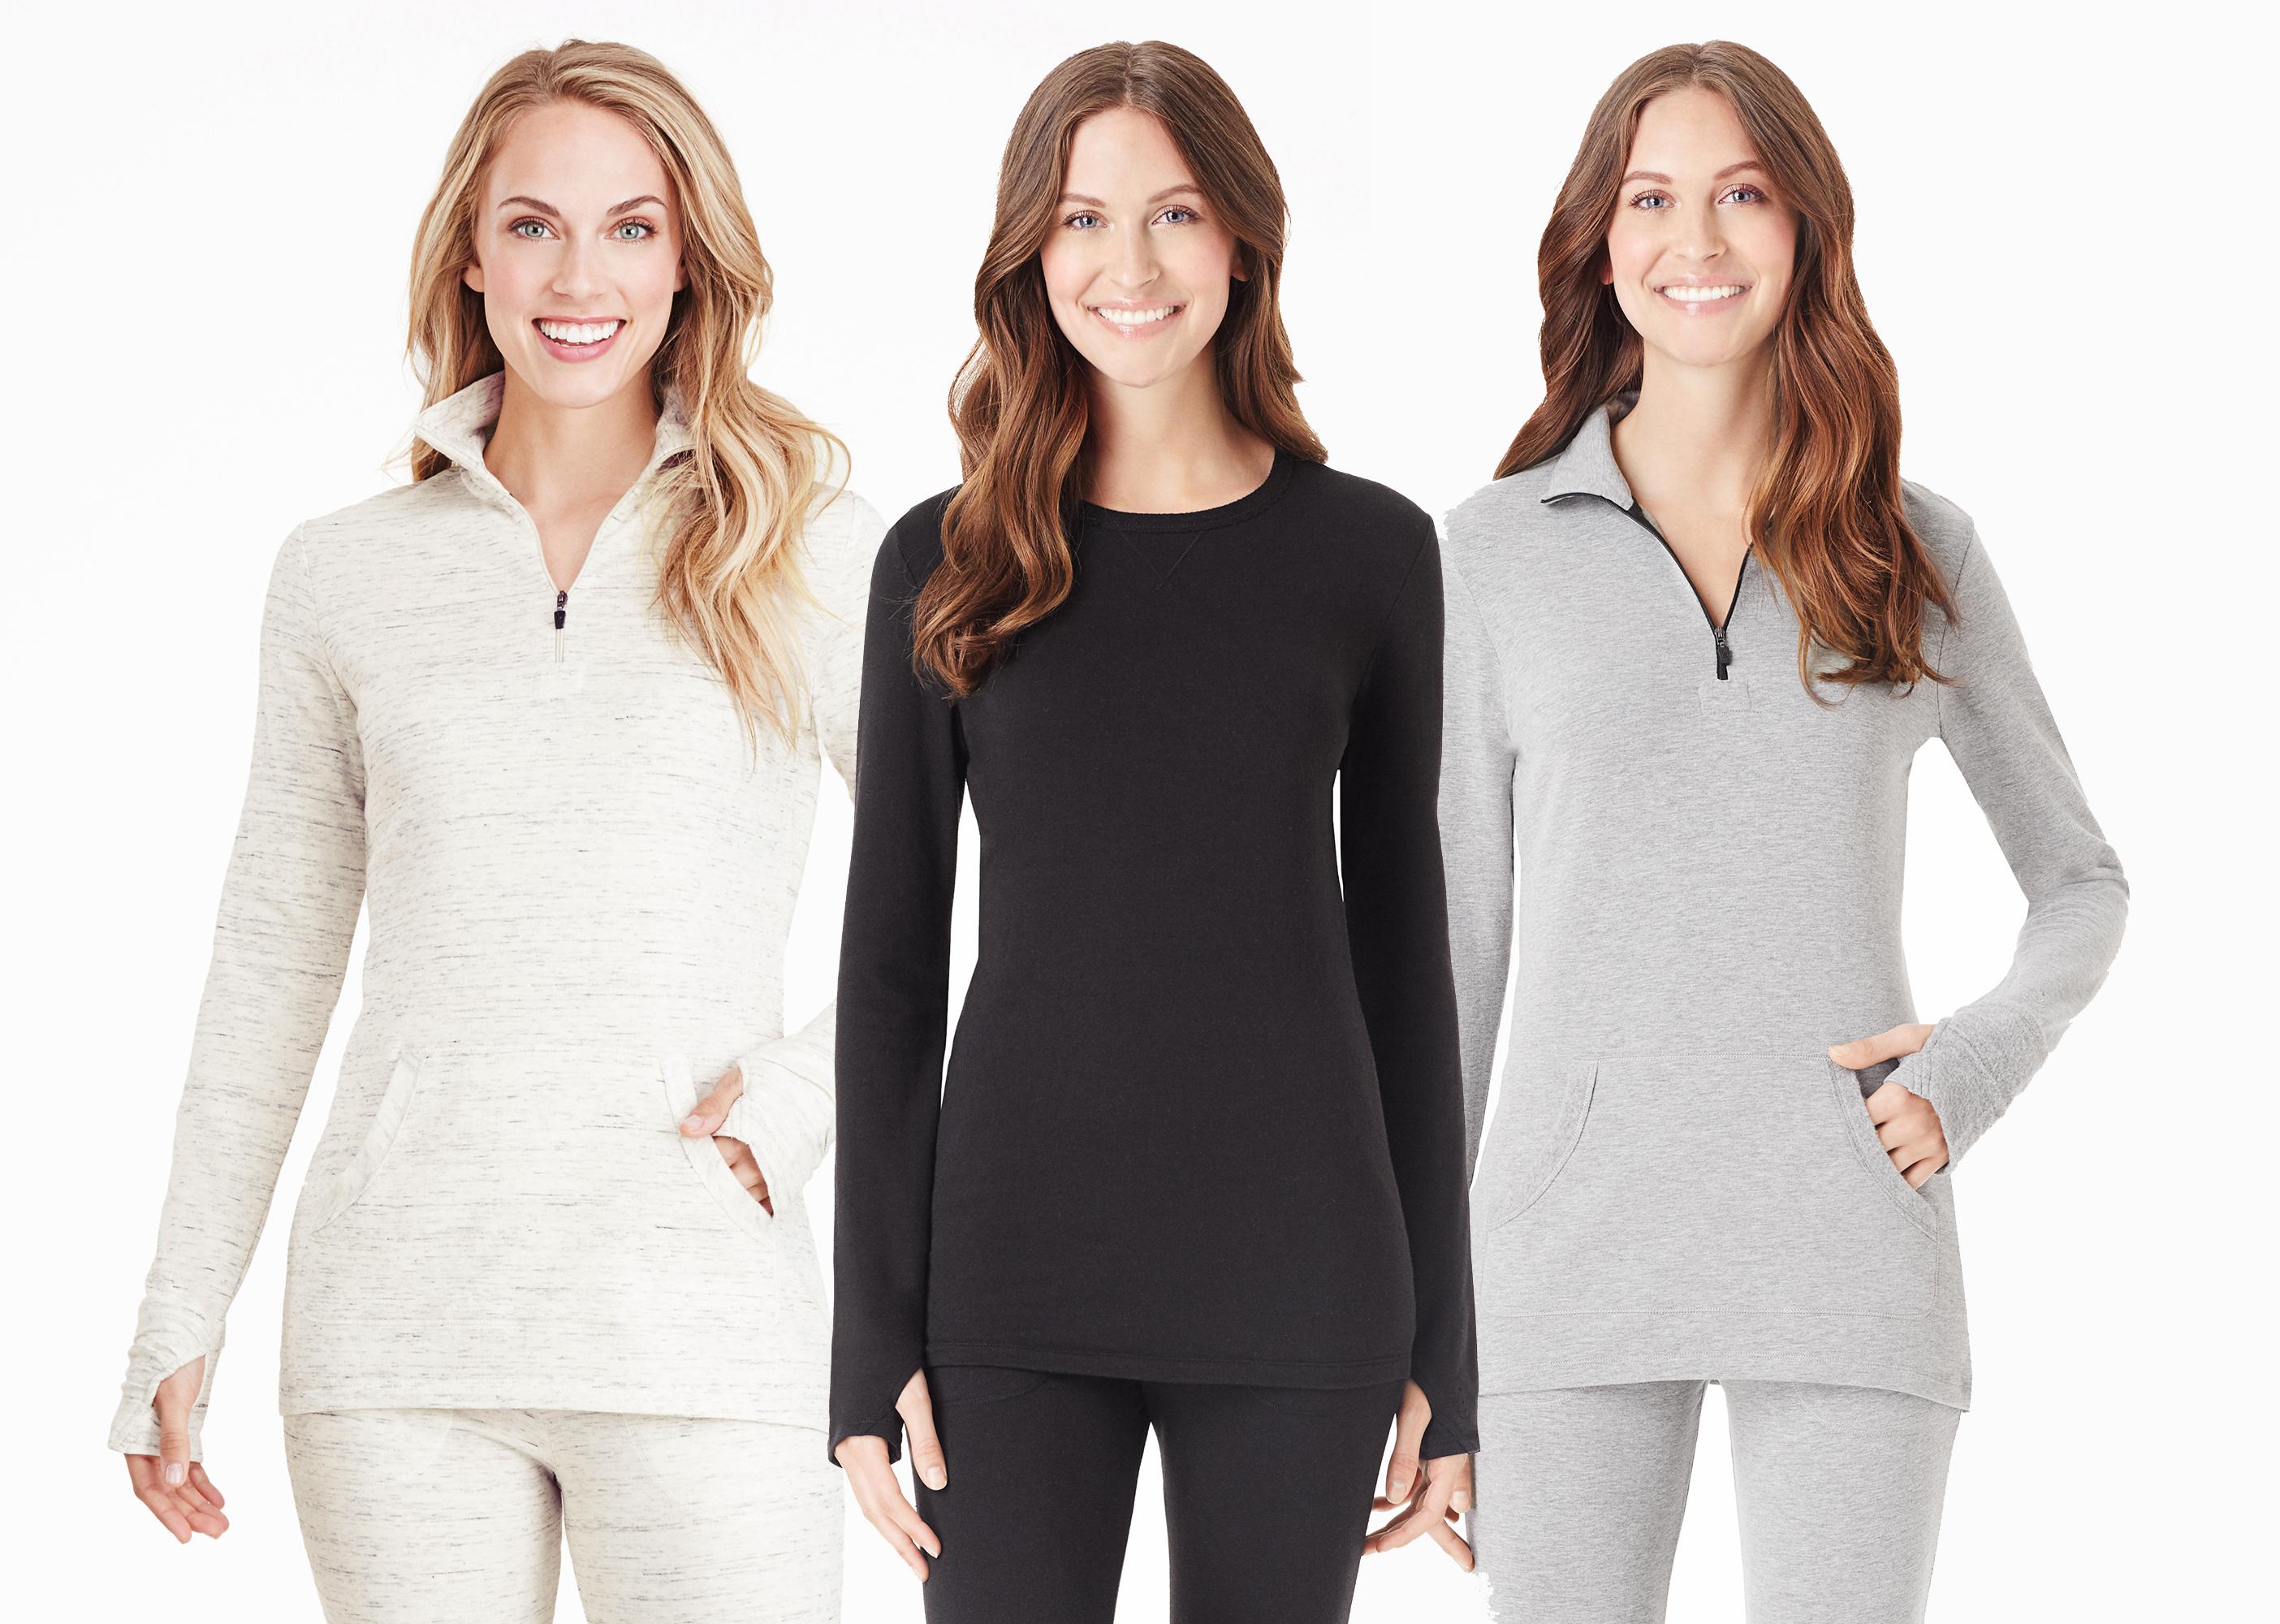 Cuddl Duds Comfortwear in grey, blacka and ivory